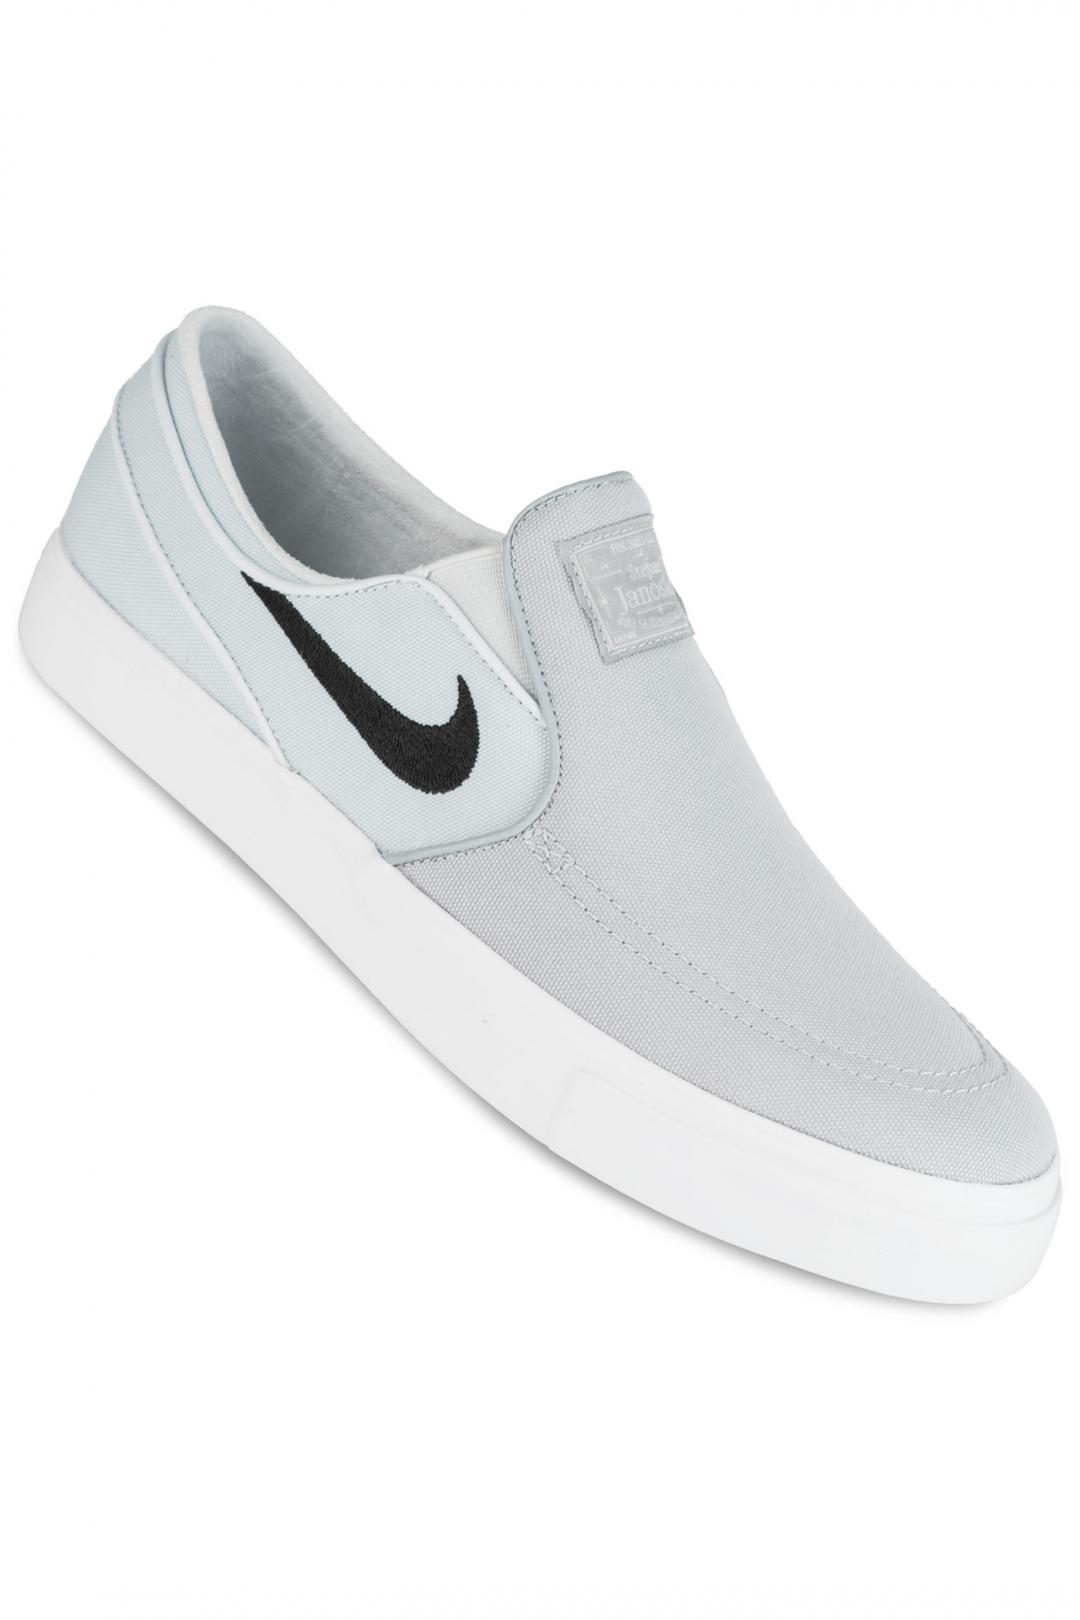 Uomo Nike SB Zoom Stefan Janoski Slip Canvas wolf grey black | Scarpe da skate